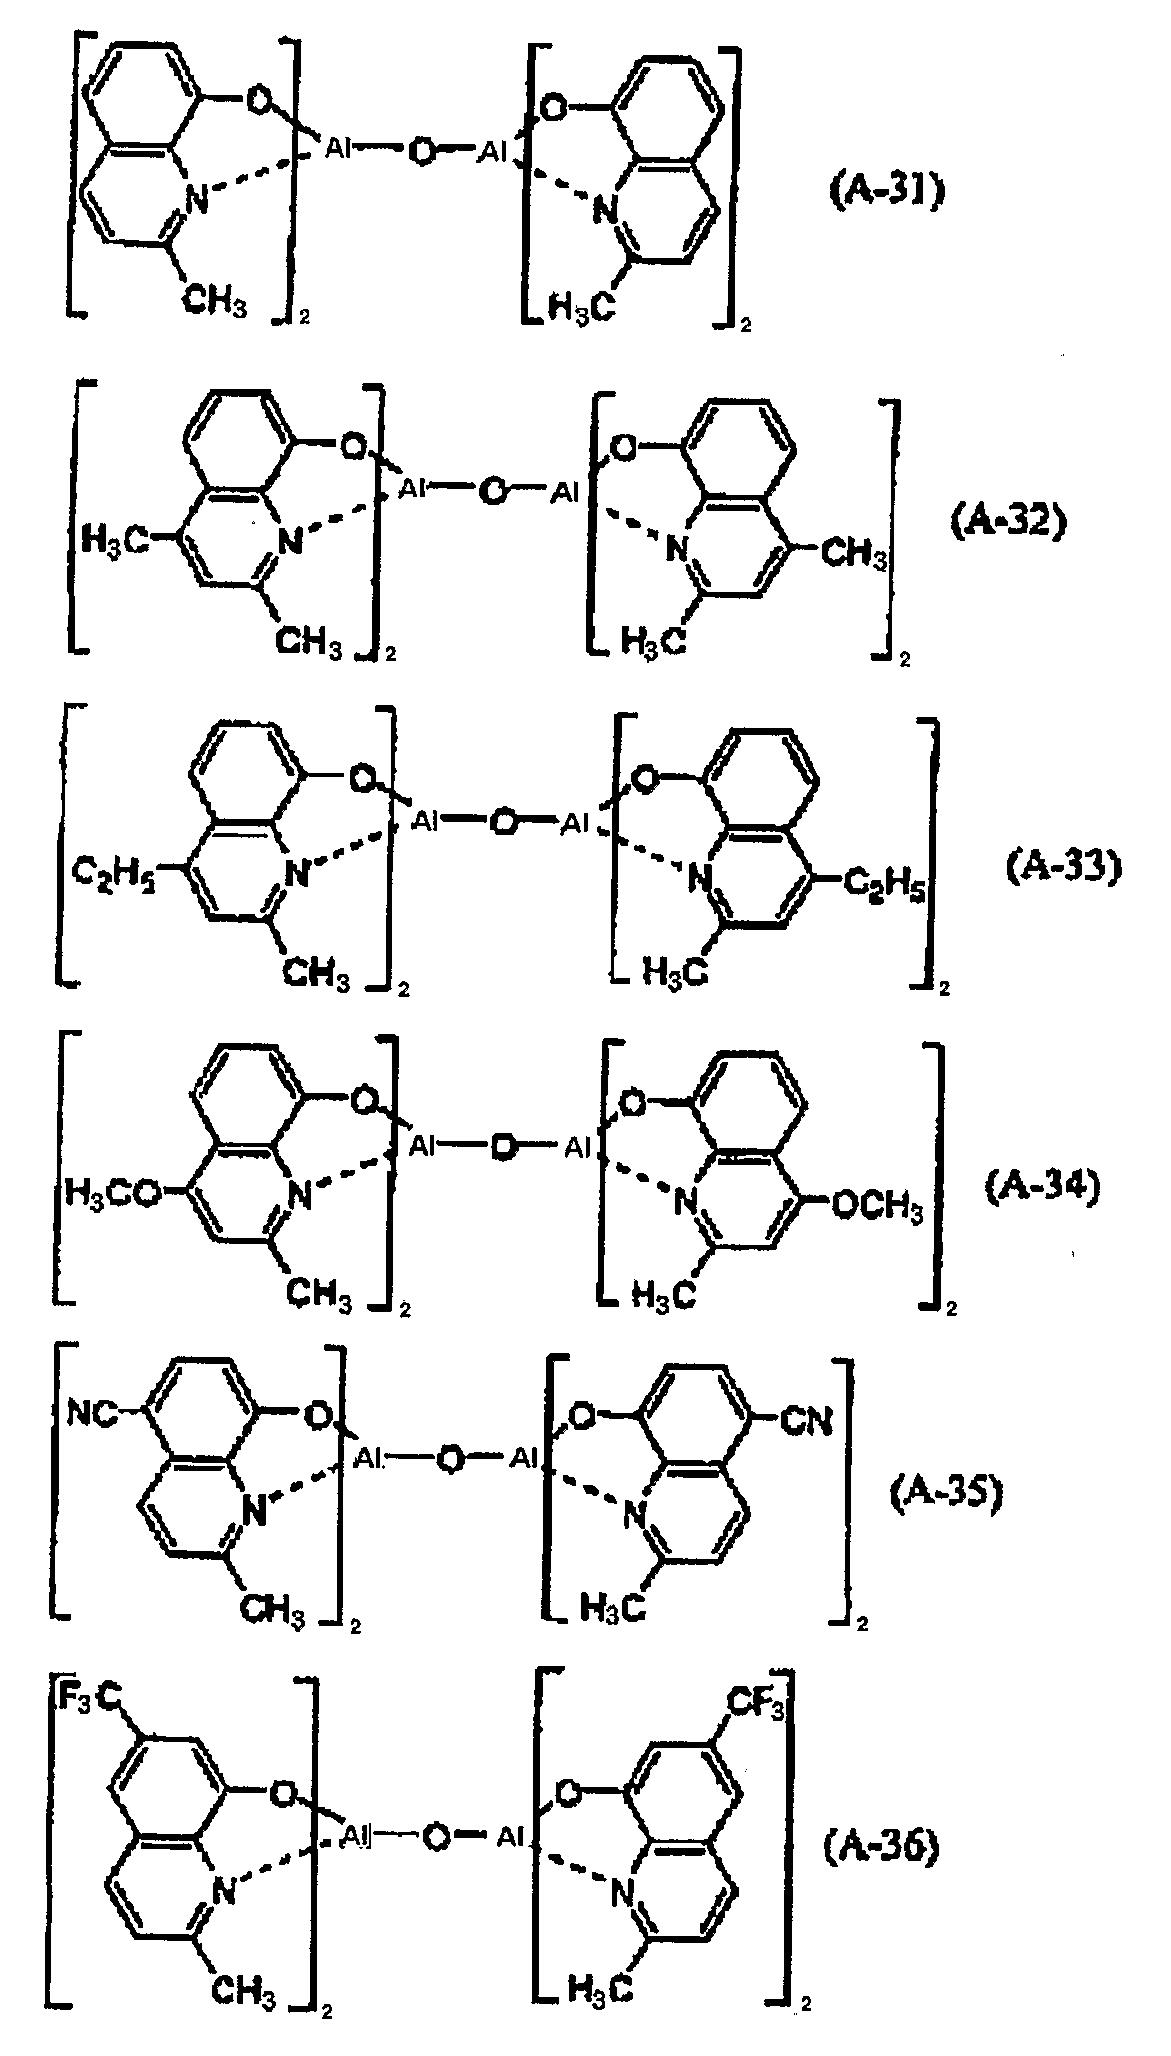 Figure WO-DOC-CHEMICAL-25